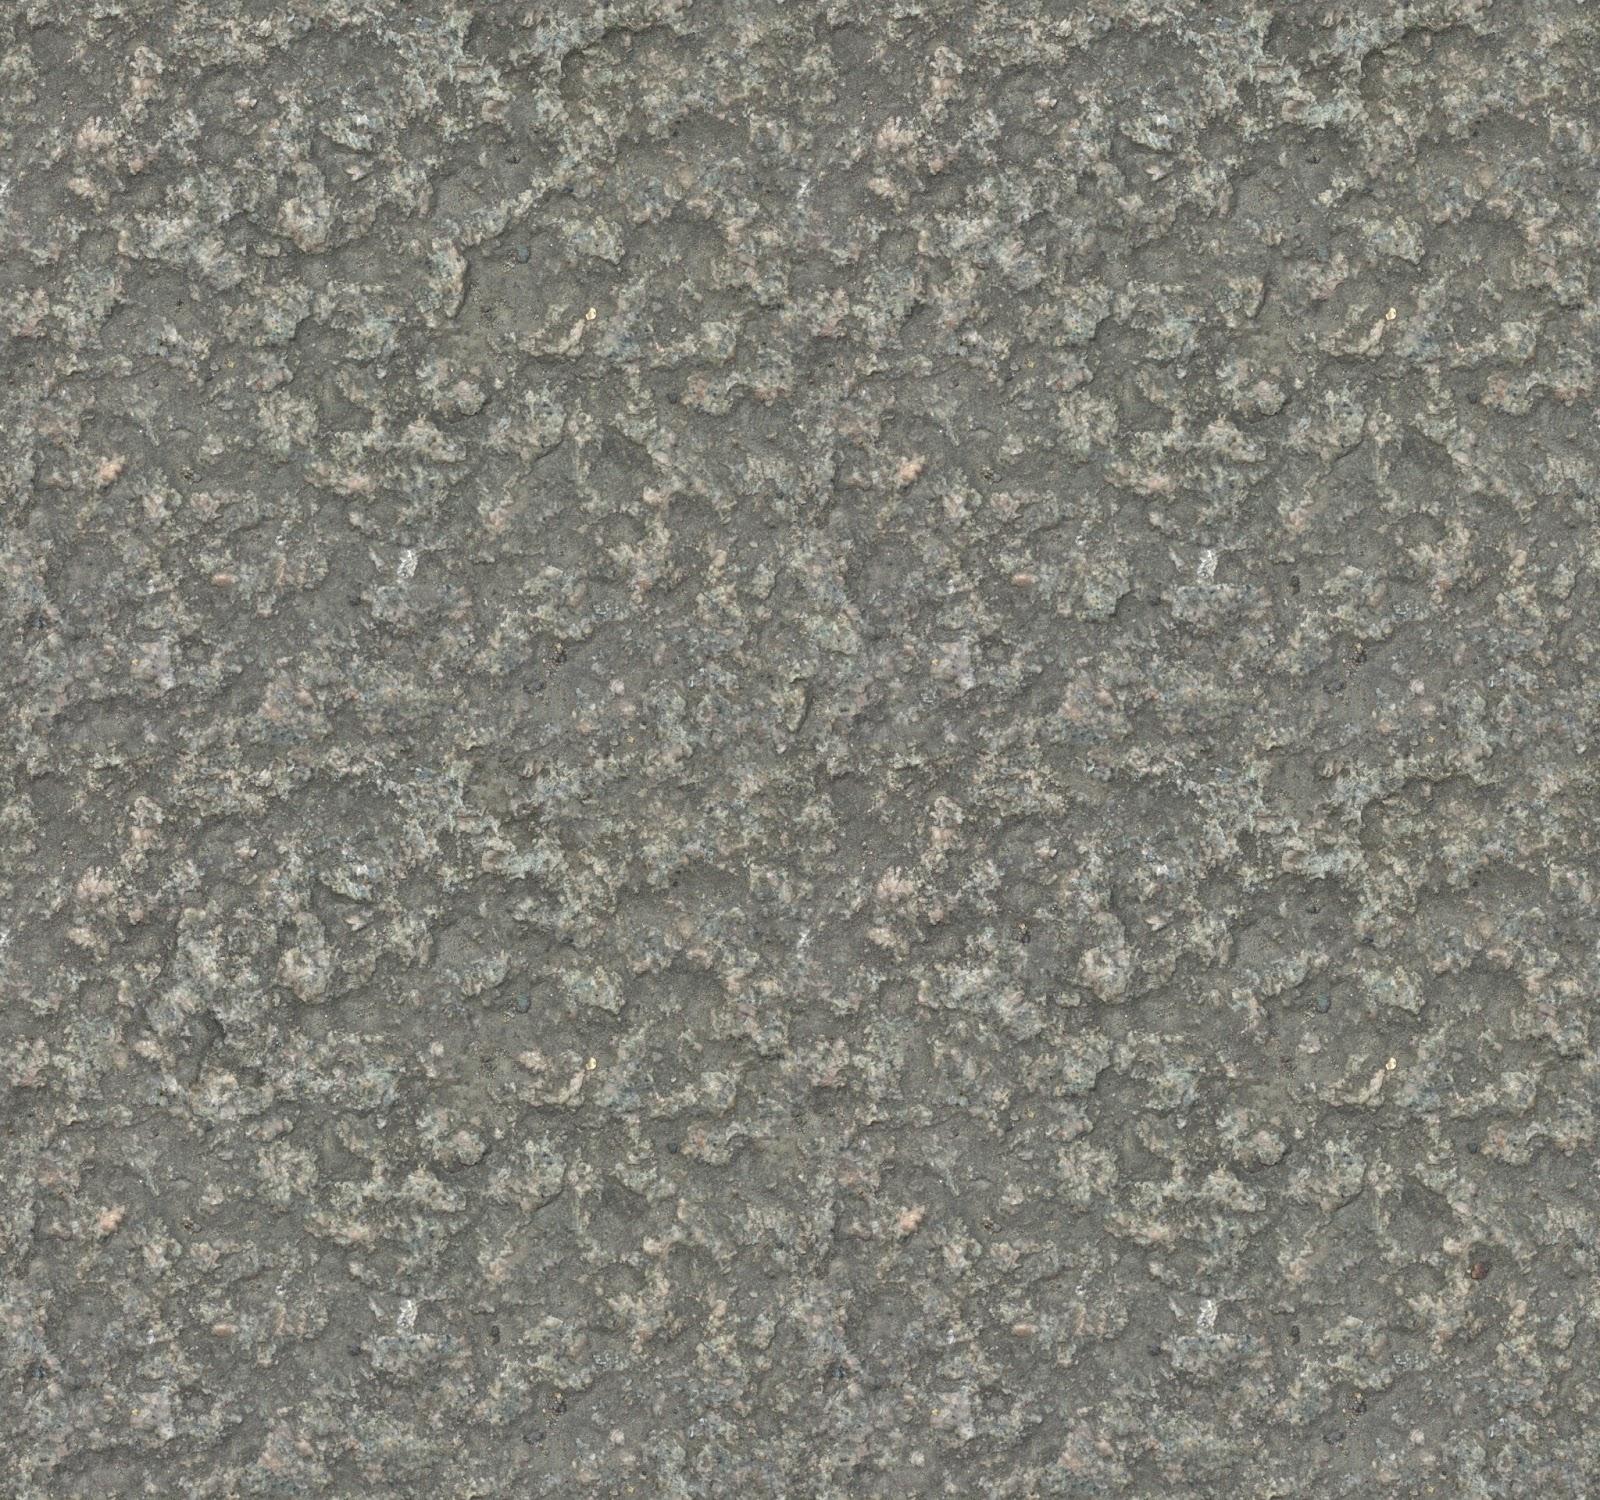 High Resolution Seamless Textures Concrete 15 Floor